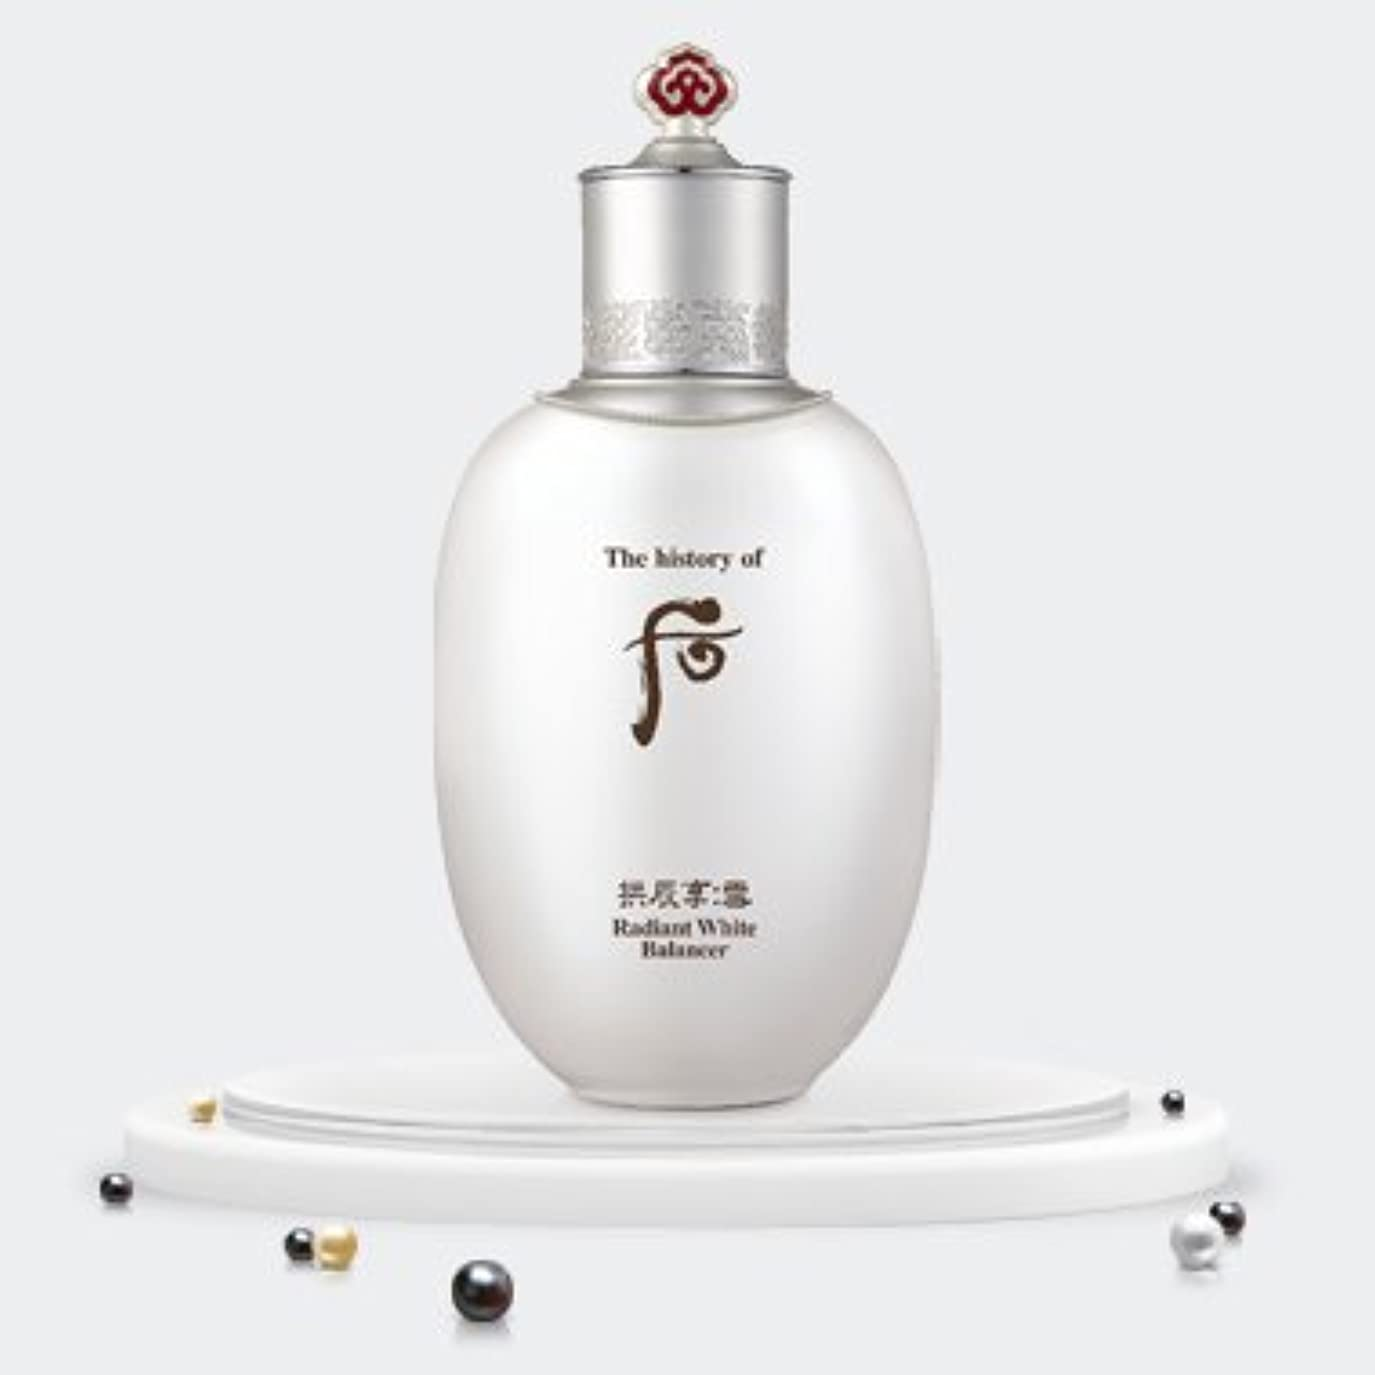 The history of Whoo Gongjinhyang Seol Radiant White Balancer 150ml/ザ ヒストリー オブ フー (后) 拱辰享 雪 ラディアント ホワイト バランサー 150ml